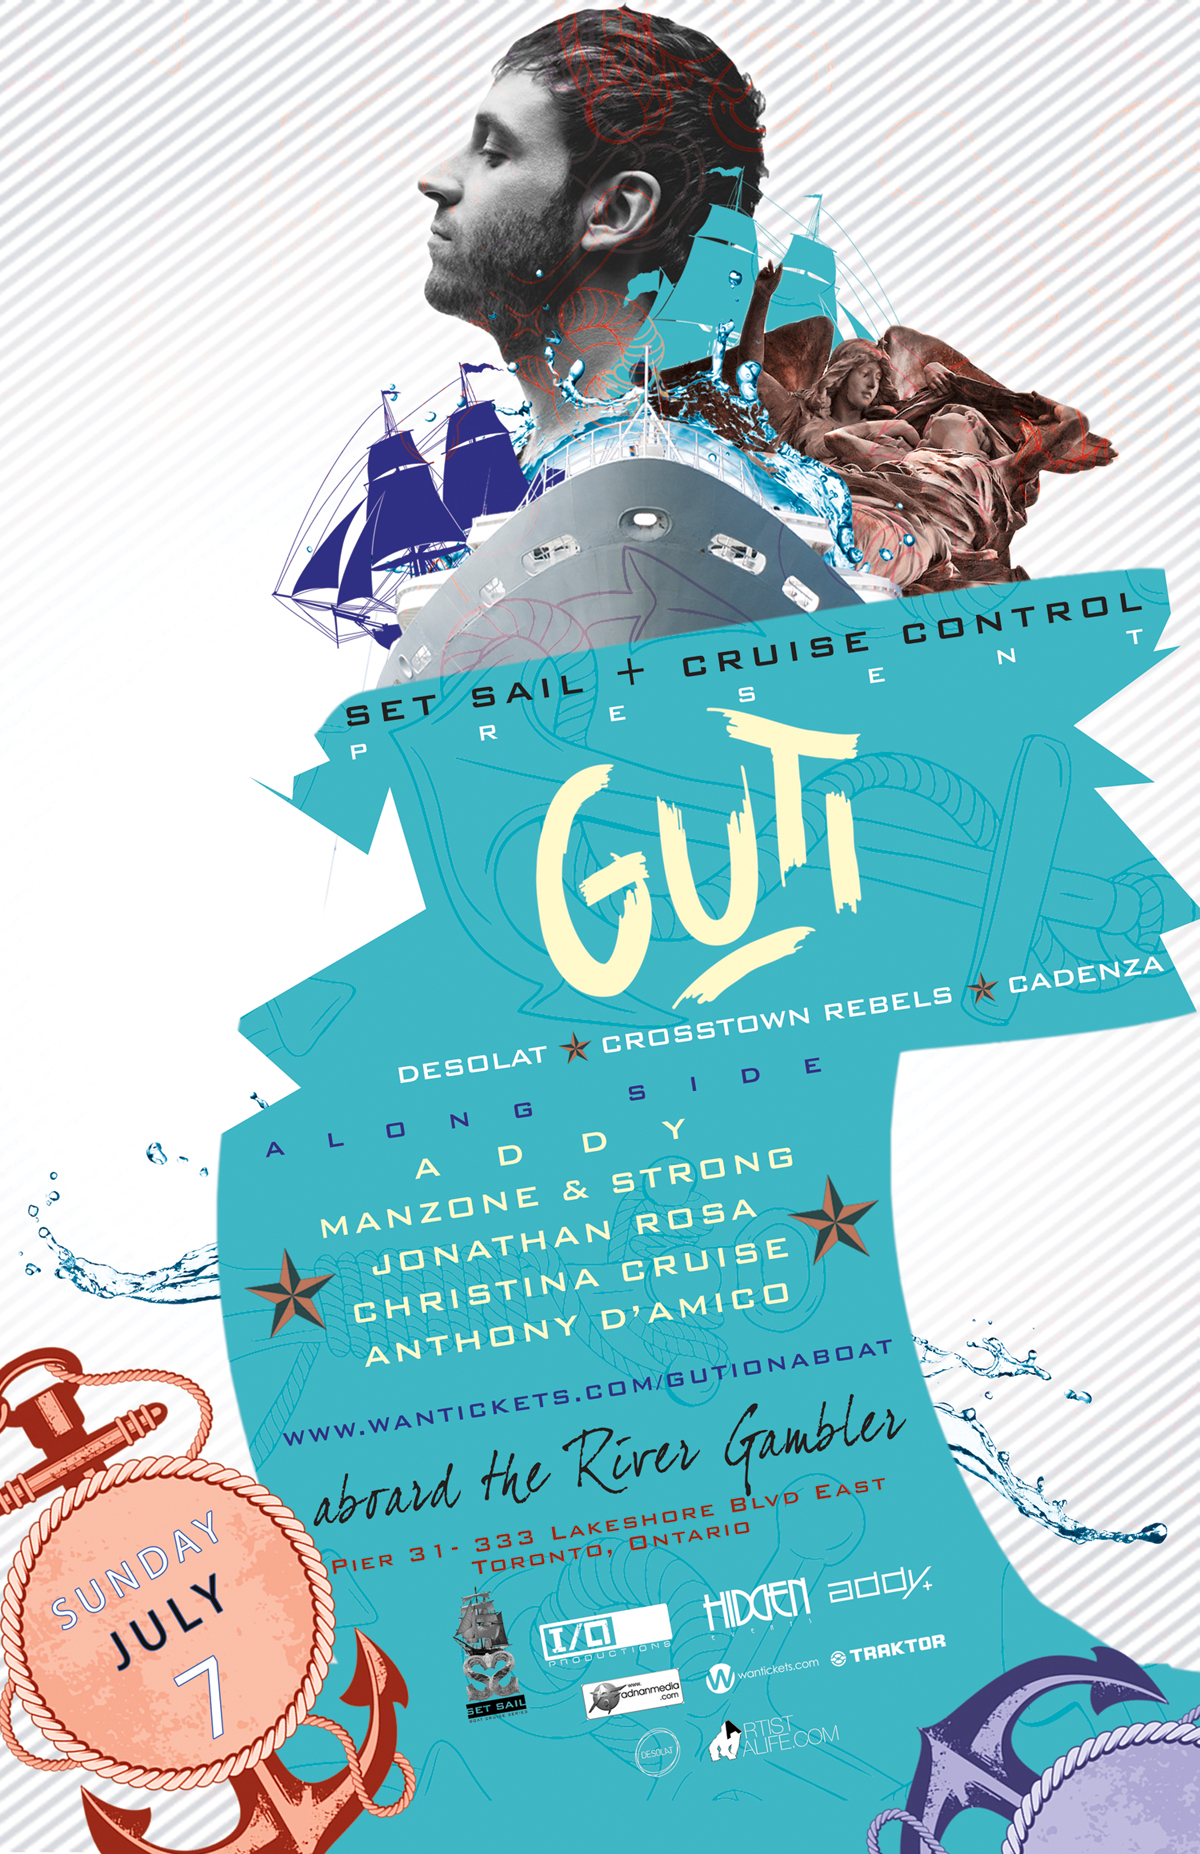 G  uti w/ Addy, Manzone & Strong, Jonathan Rosa, Christina Cruise + More Toronto